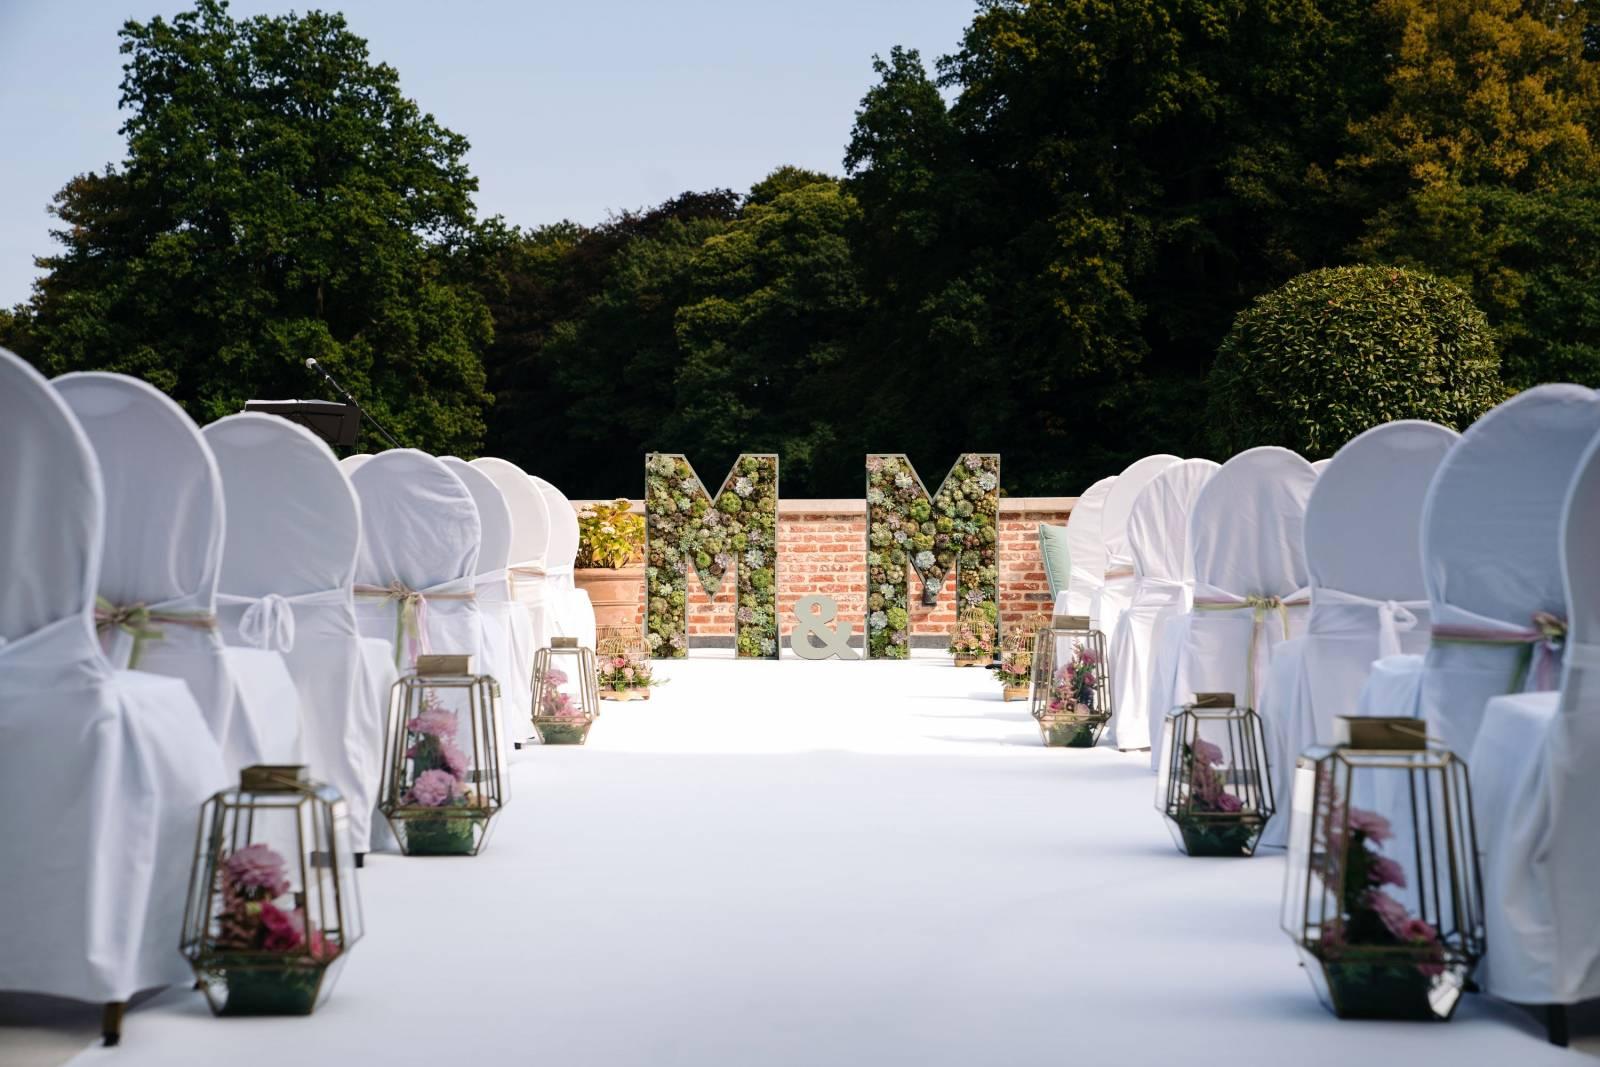 Sfeerlab - Trouwdecoratie - House of Weddings - 14